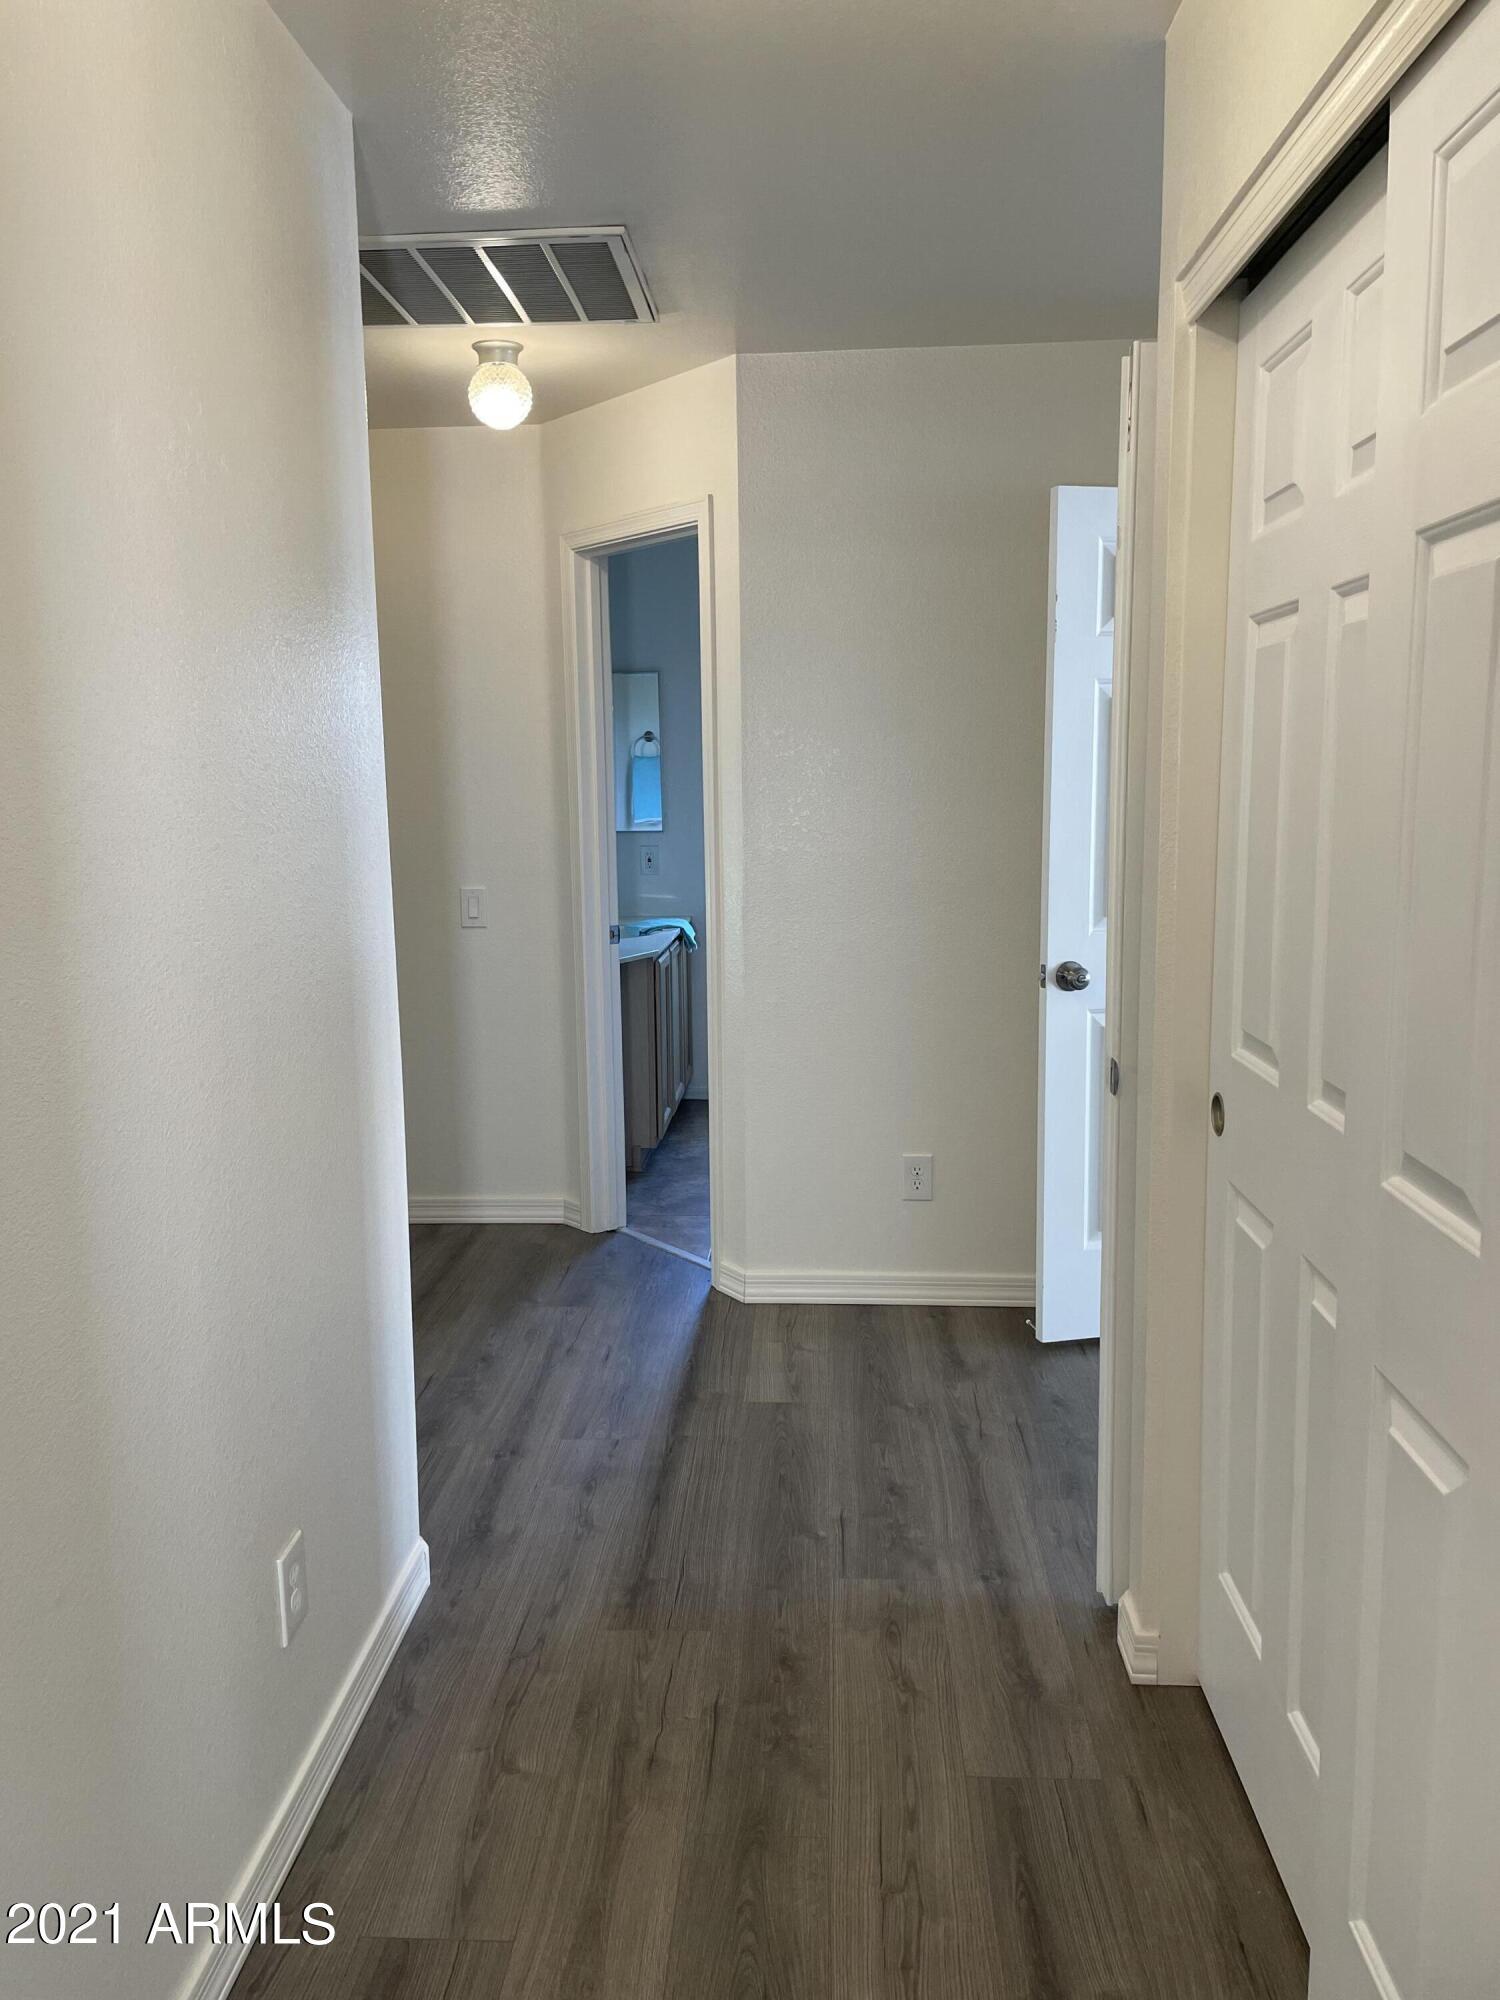 3031 KASHMIR Street, Mesa, Arizona 85215, 3 Bedrooms Bedrooms, ,2 BathroomsBathrooms,Residential,For Sale,KASHMIR,6235785